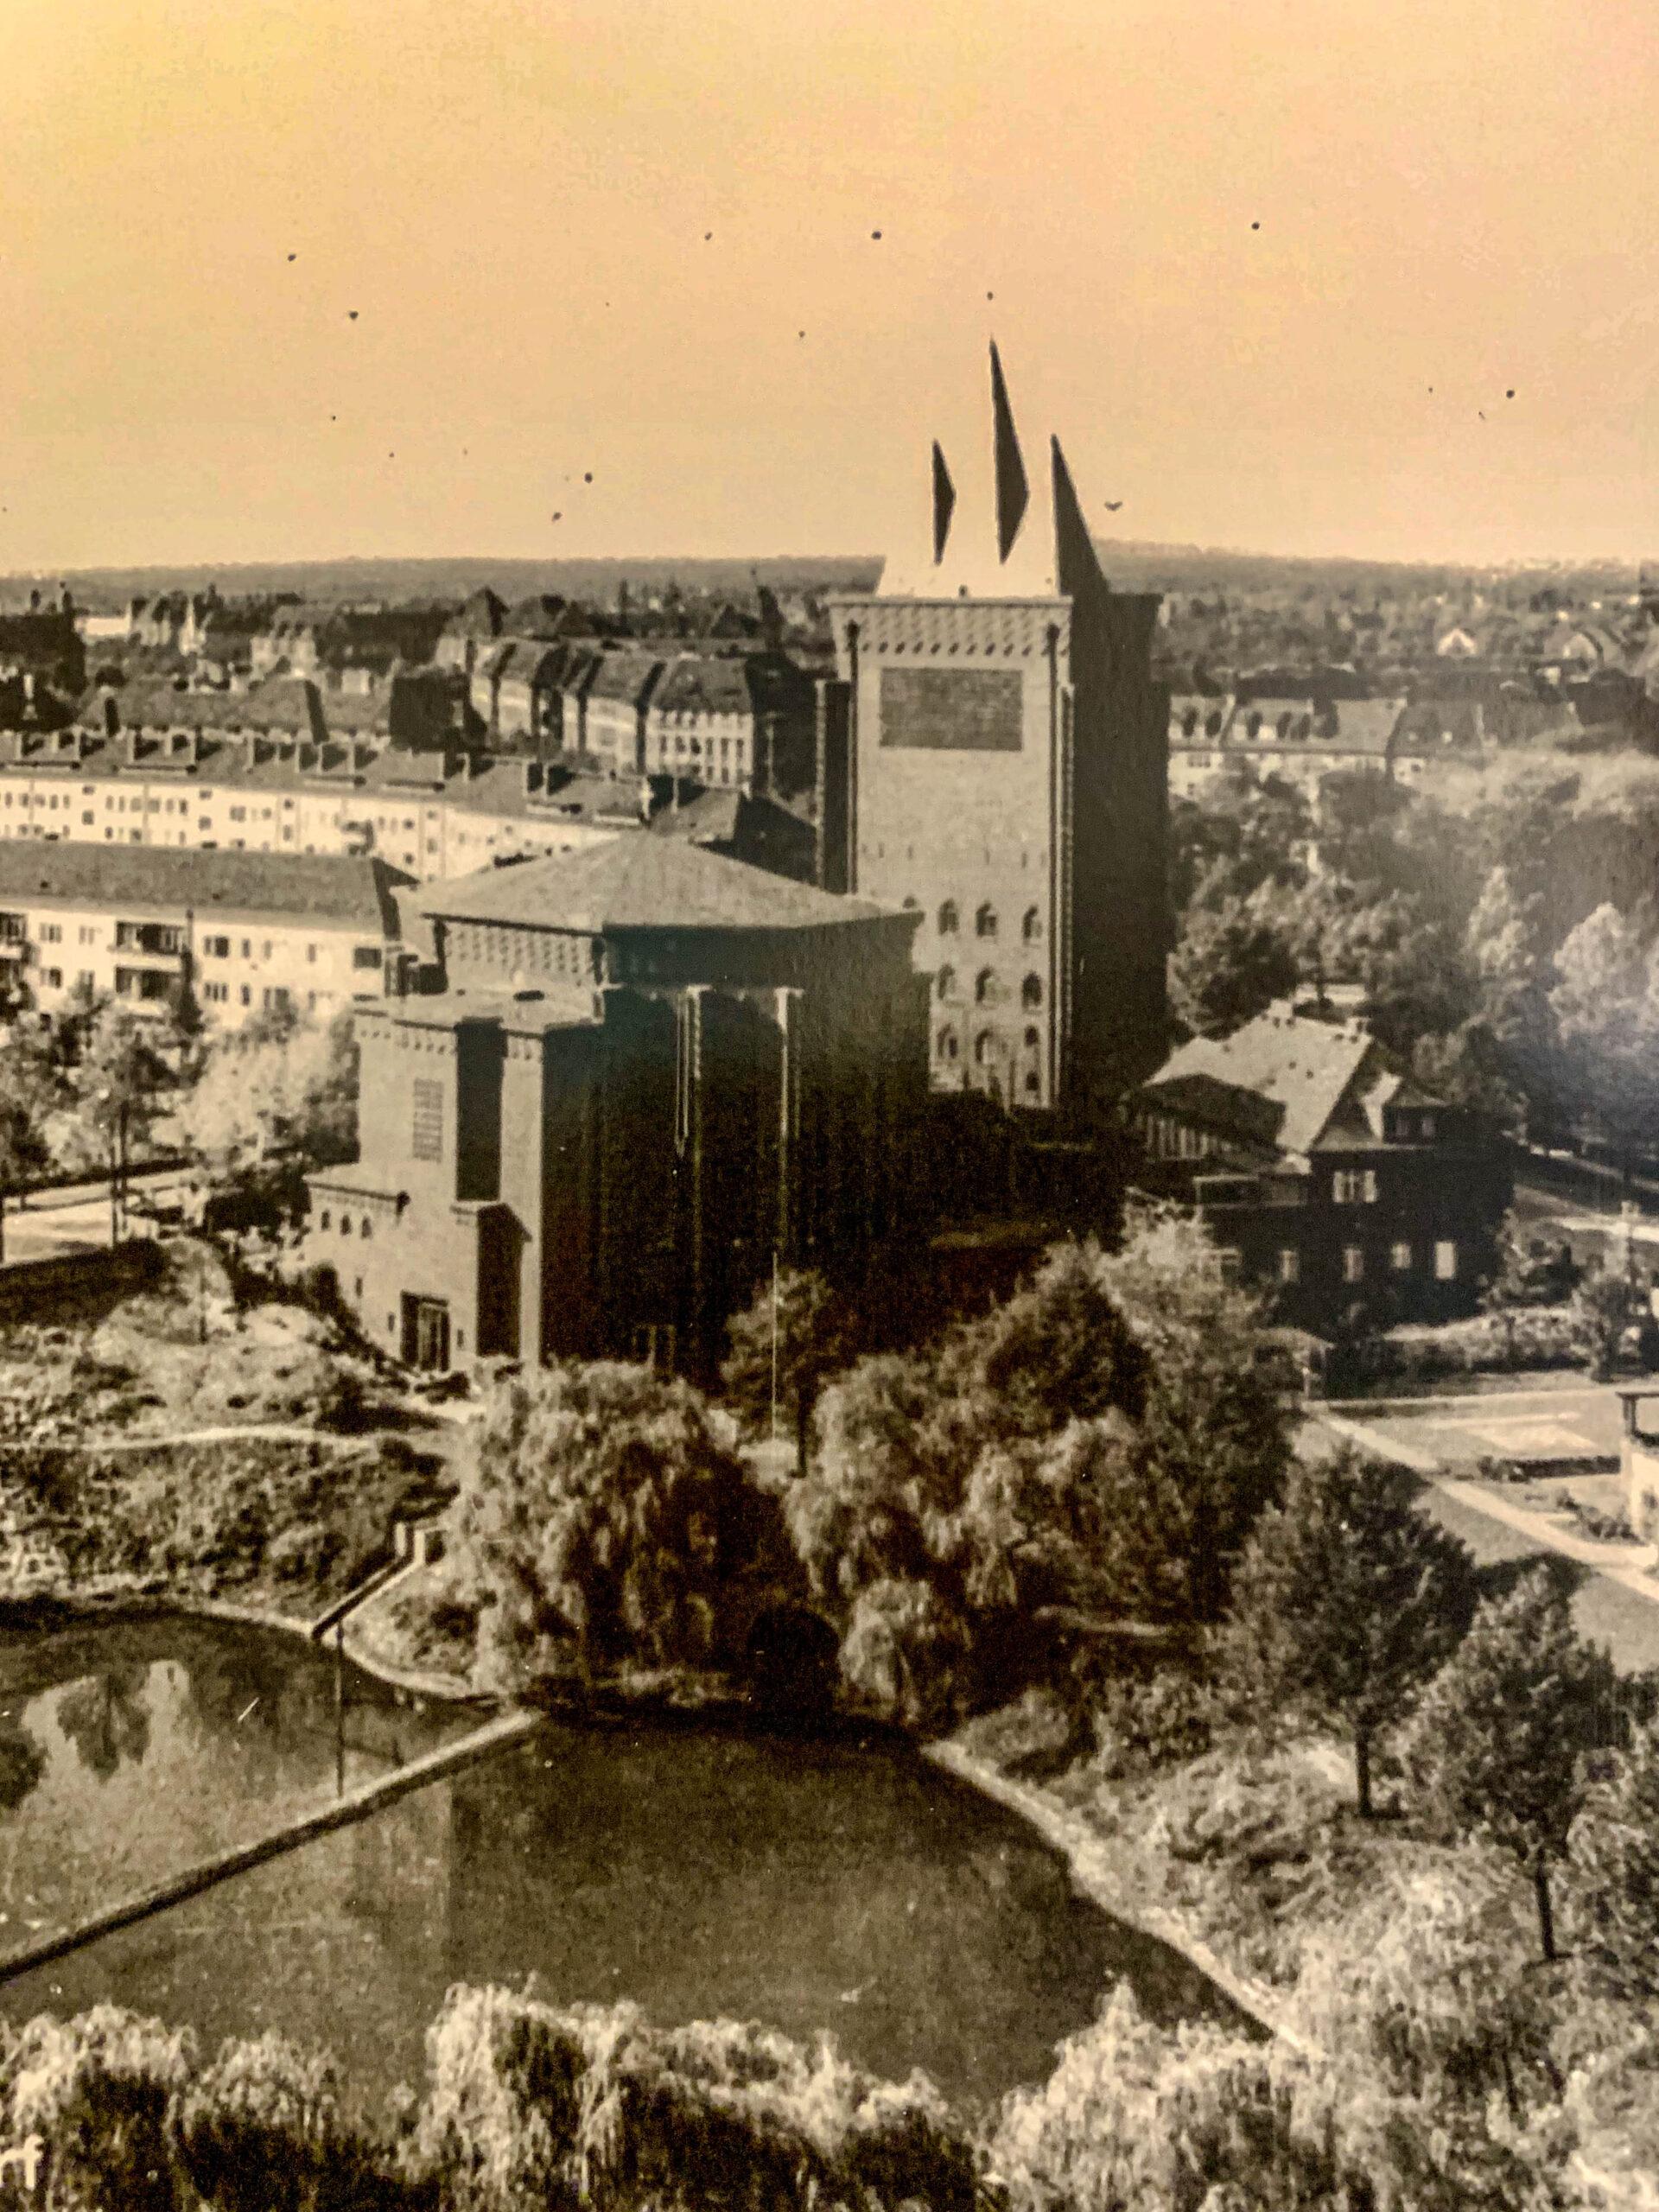 Kreuzkirche, 1927-1929. Architects: Ernst and Günther Paulus